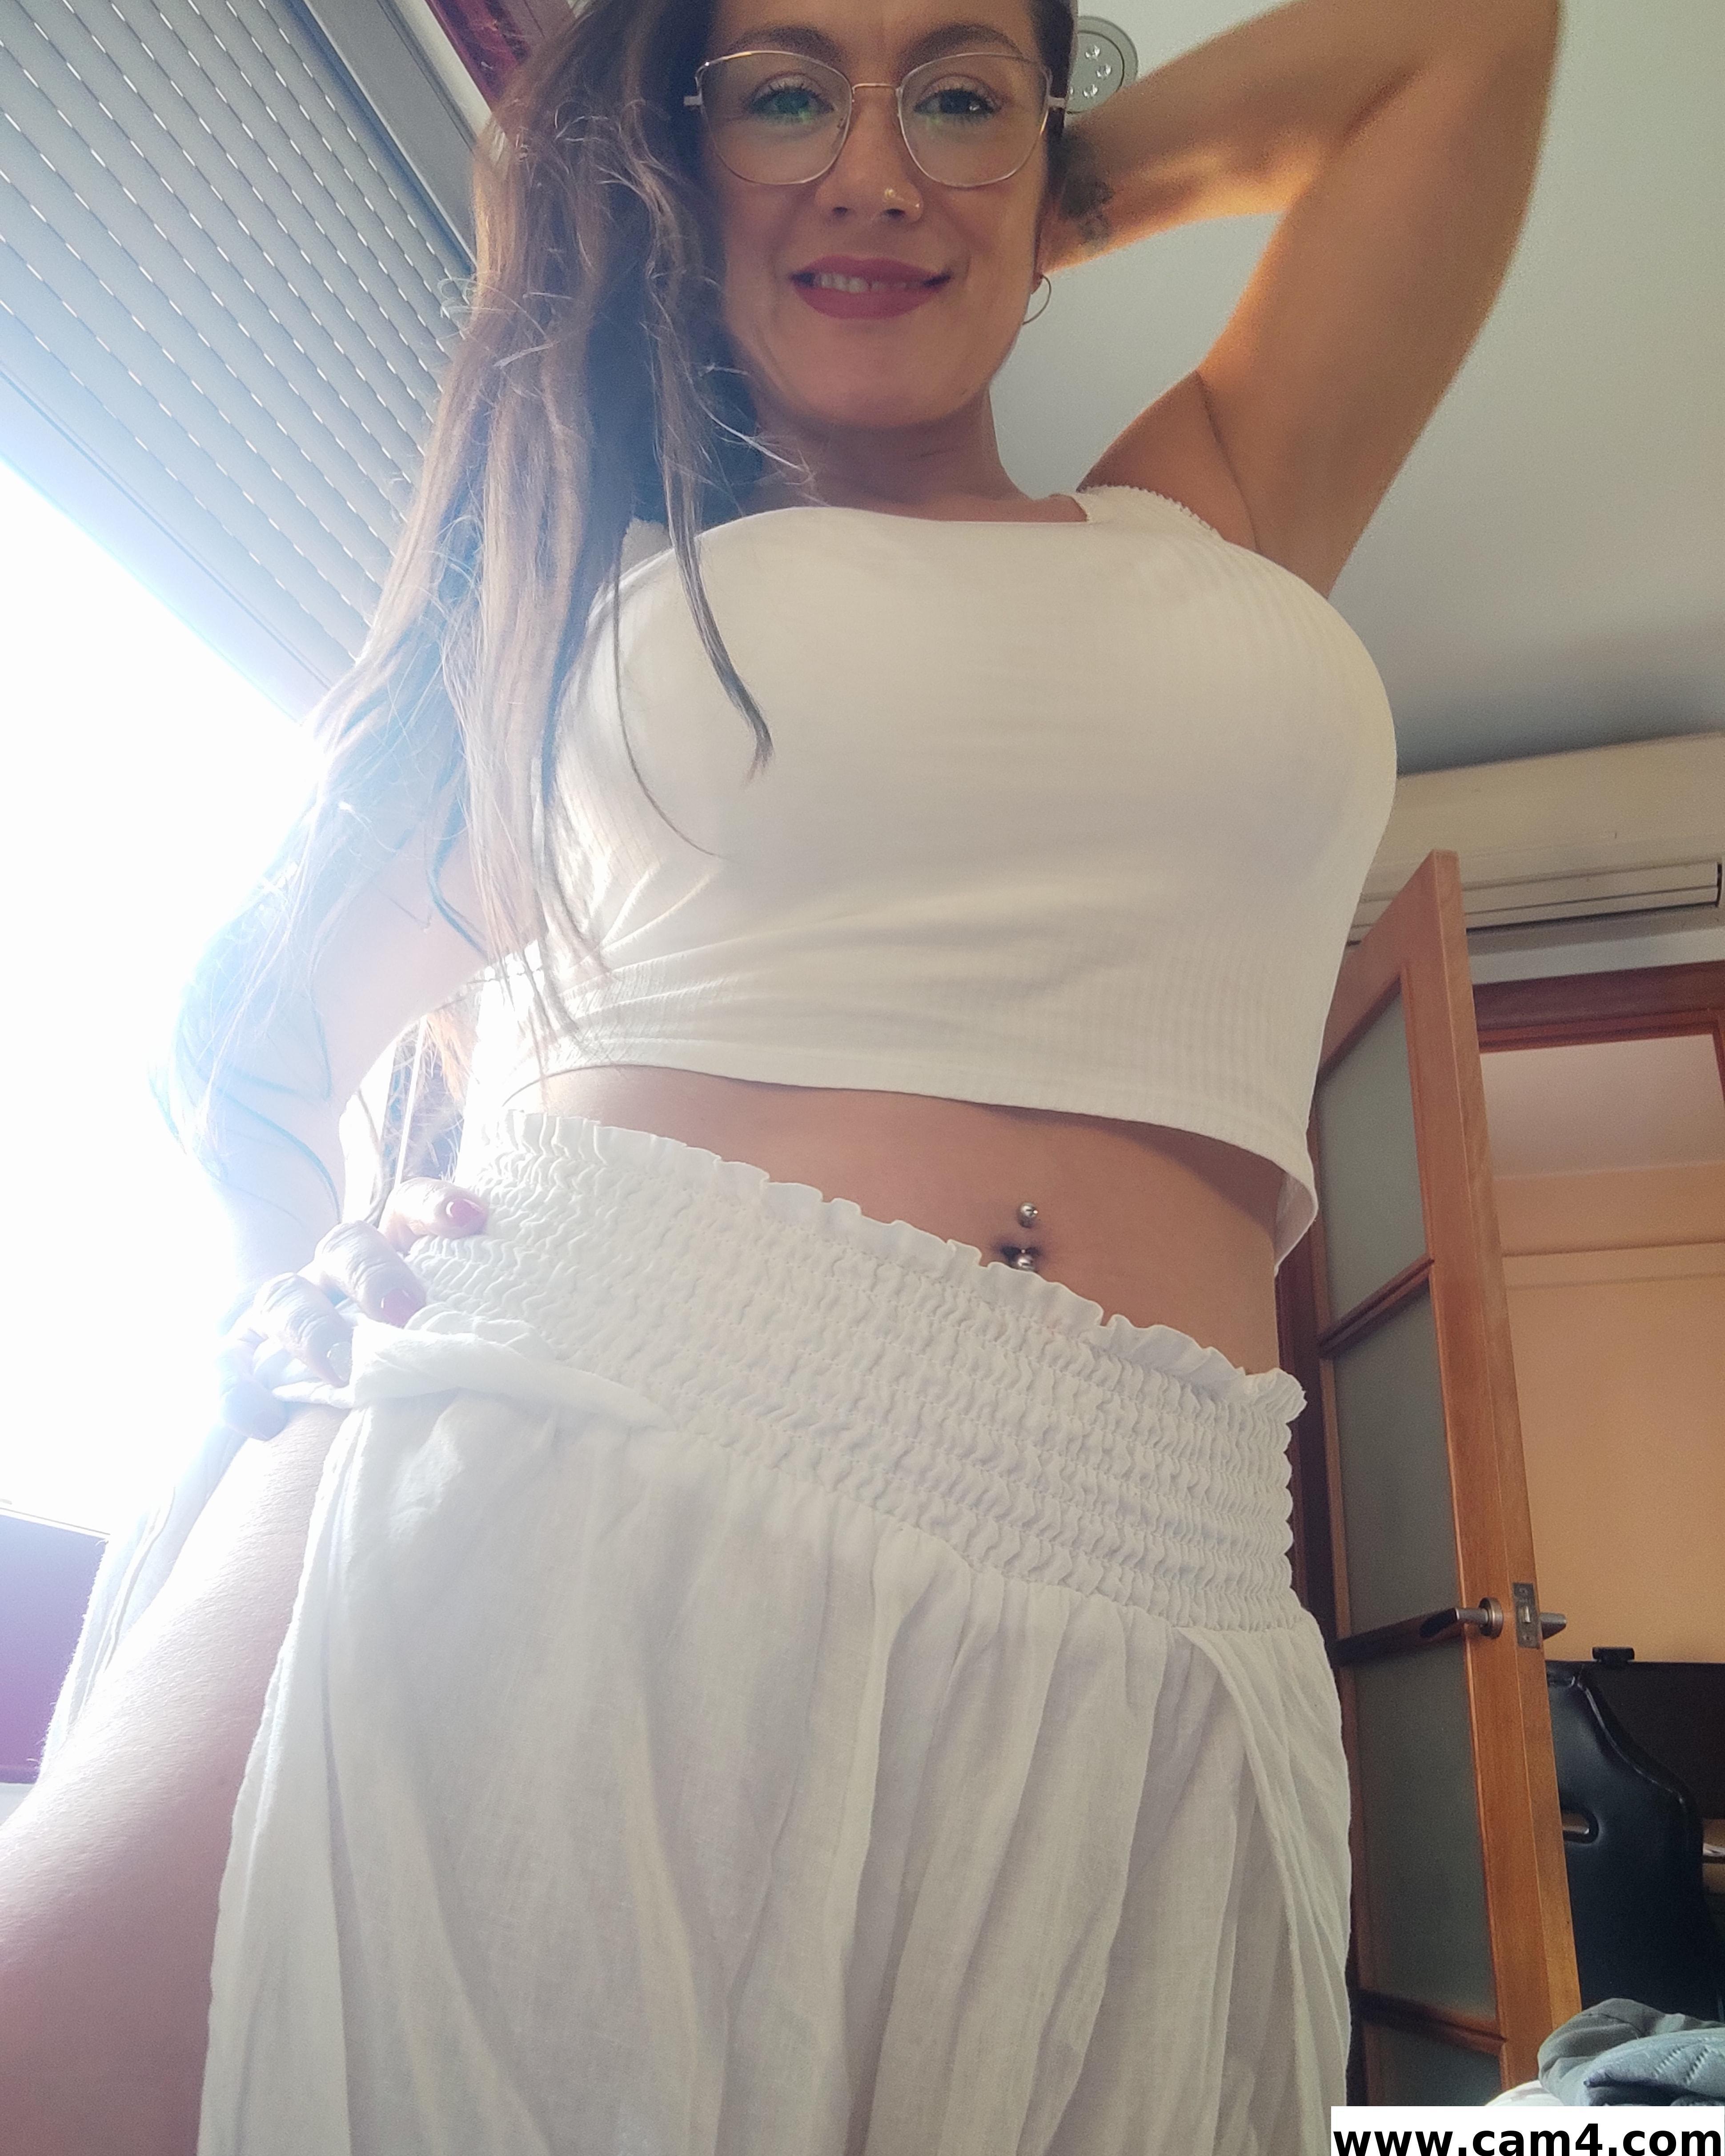 Angelita81?s=kdvlustoag540ivex1ete9vmdgcwzziux+h7am89hzy=